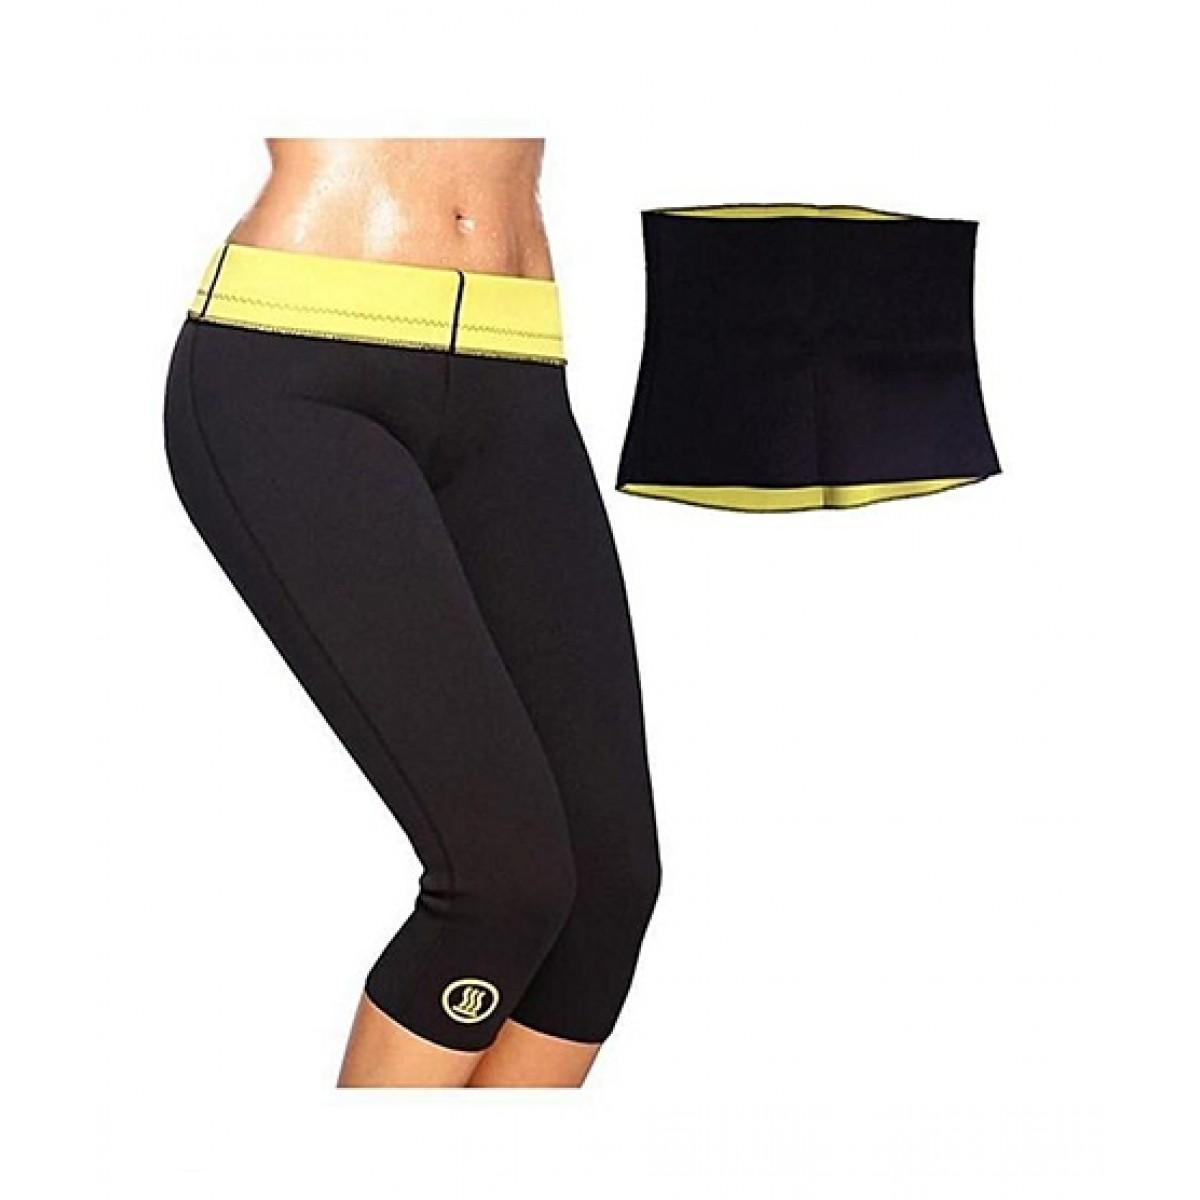 85d372f99 Pack of 2 - Slimming Pant   Hot Belt - Black   Yellow